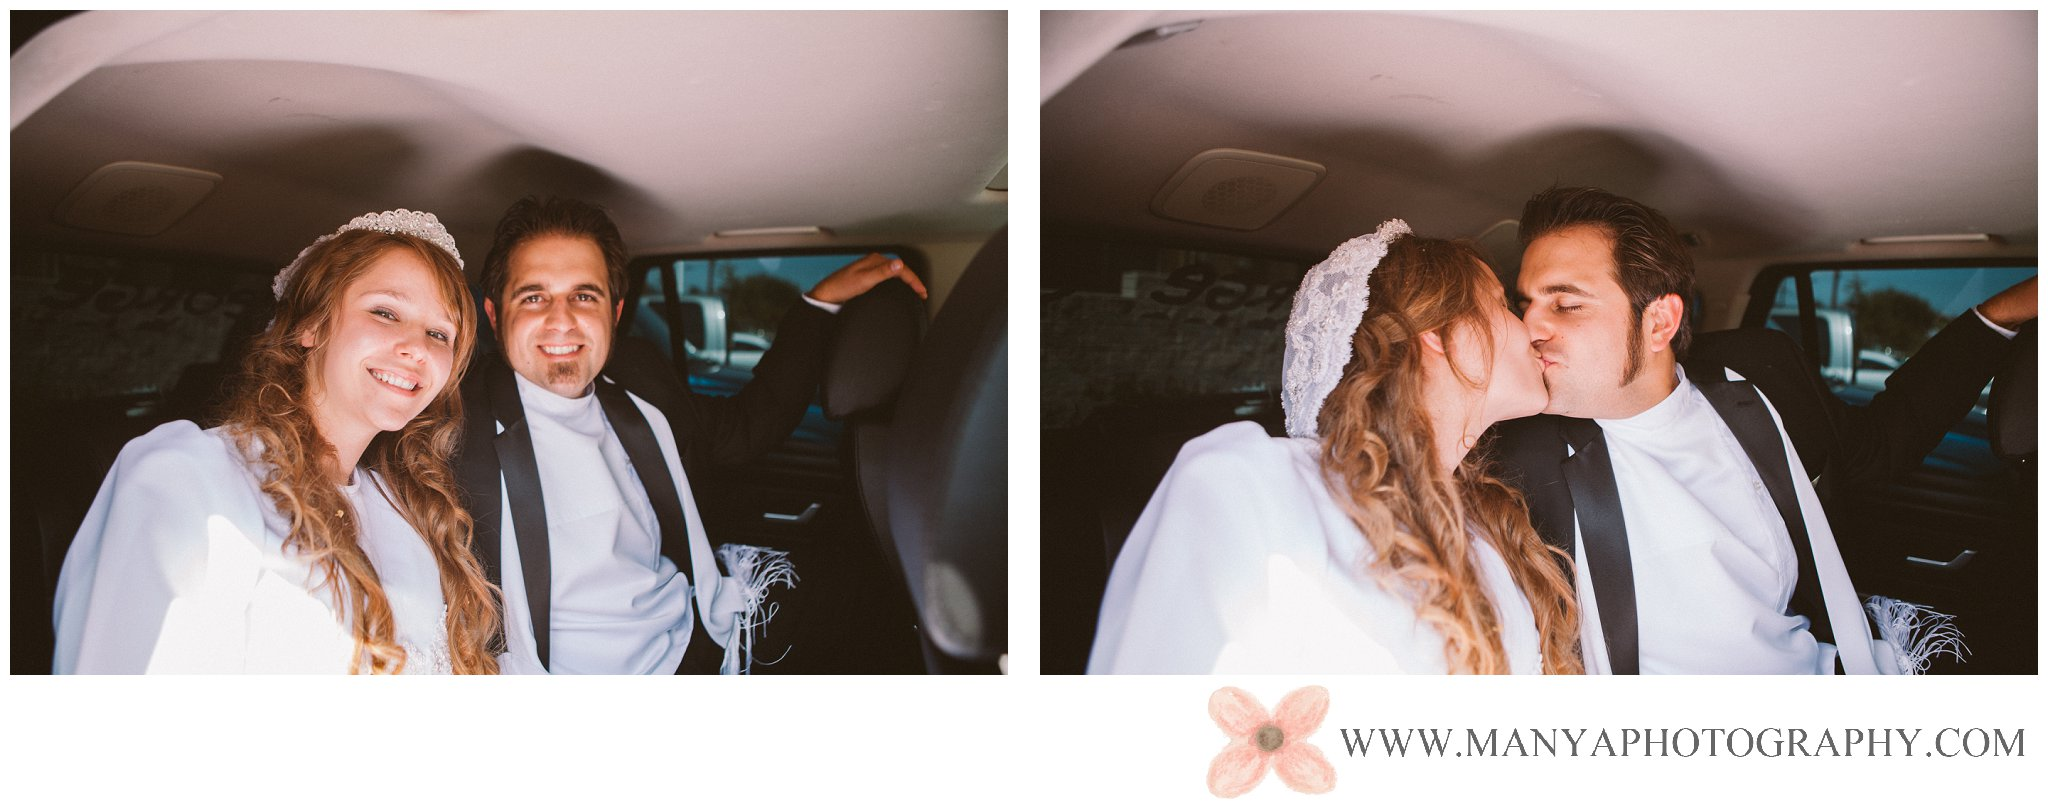 2013-10-16_0003 - Orange County Wedding Photographer